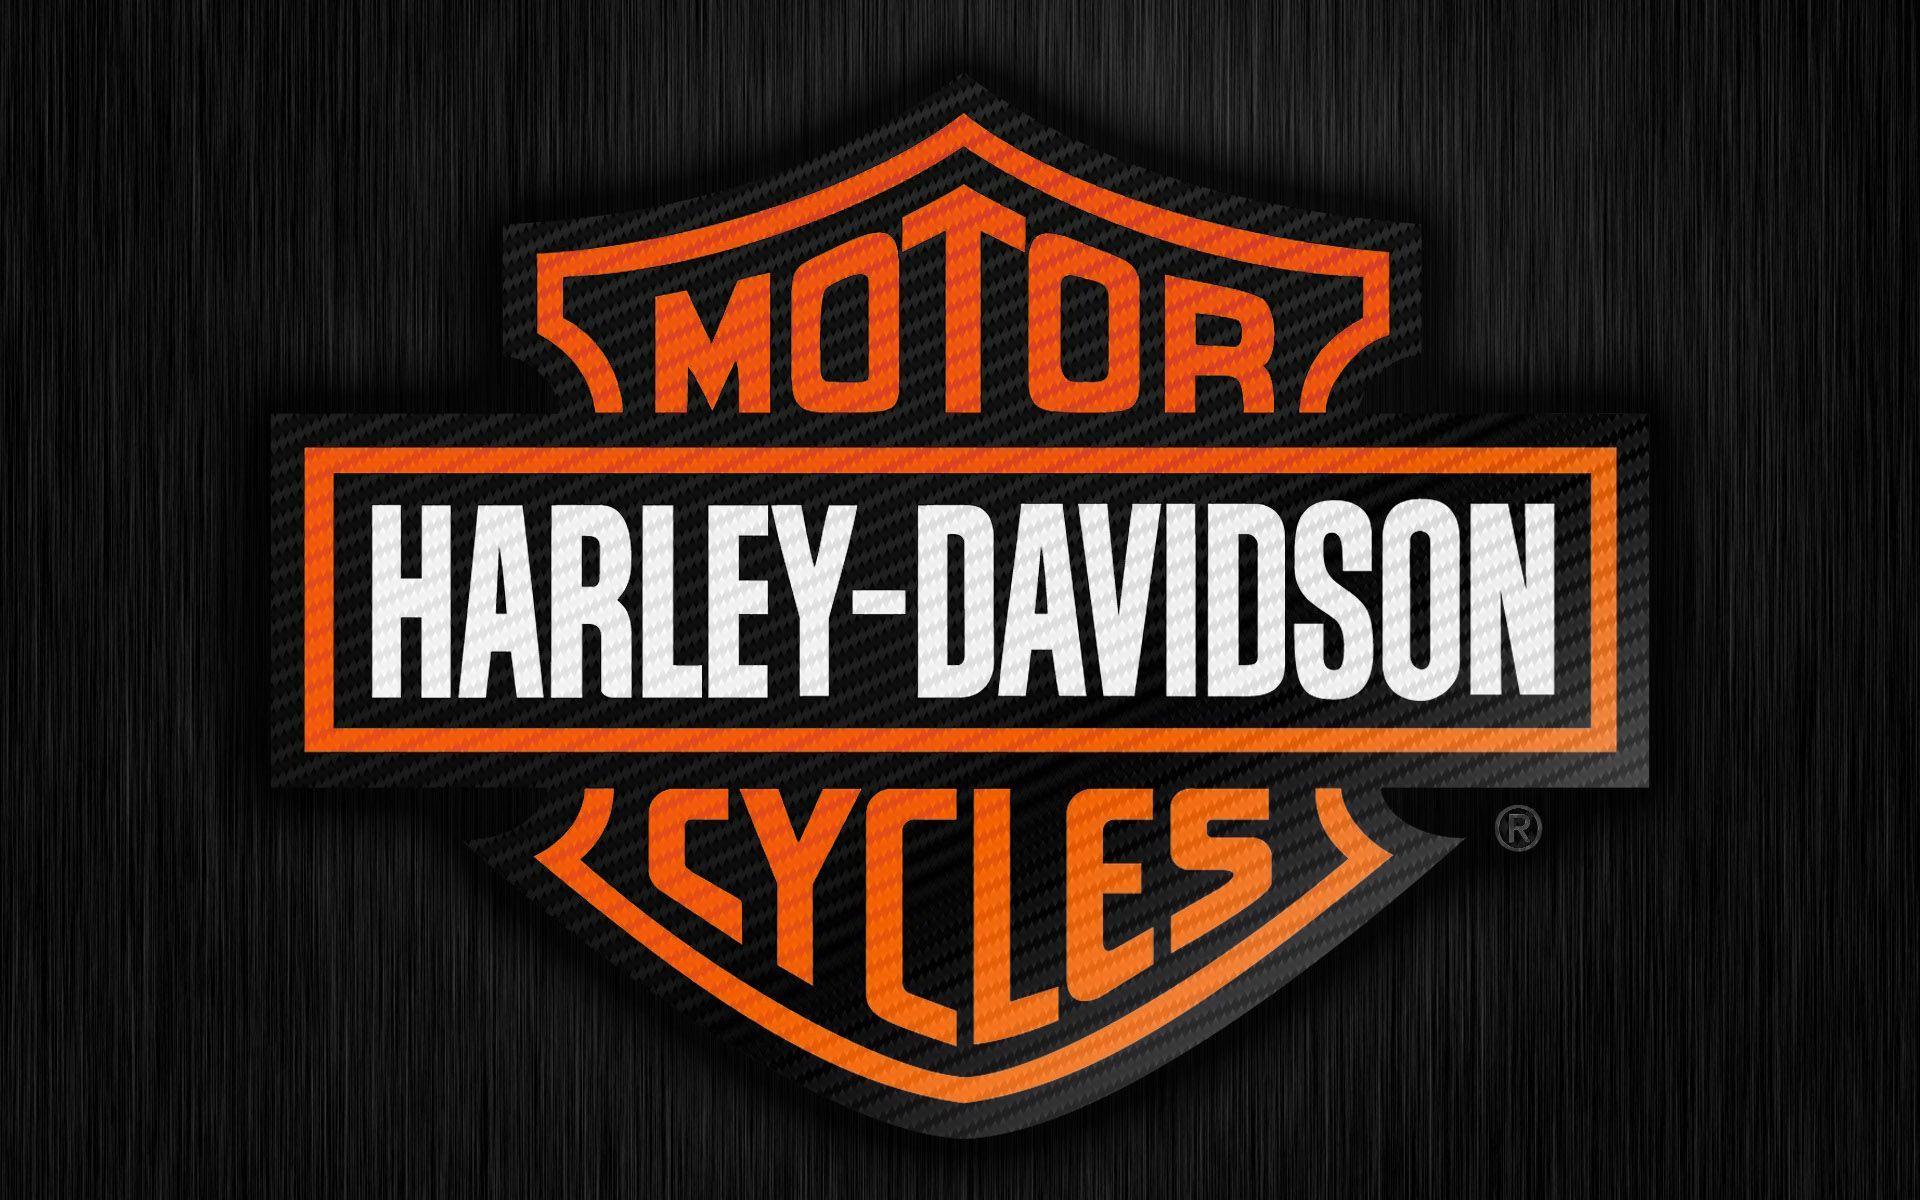 Harley Davidson Logo Wallpaper For Iphone